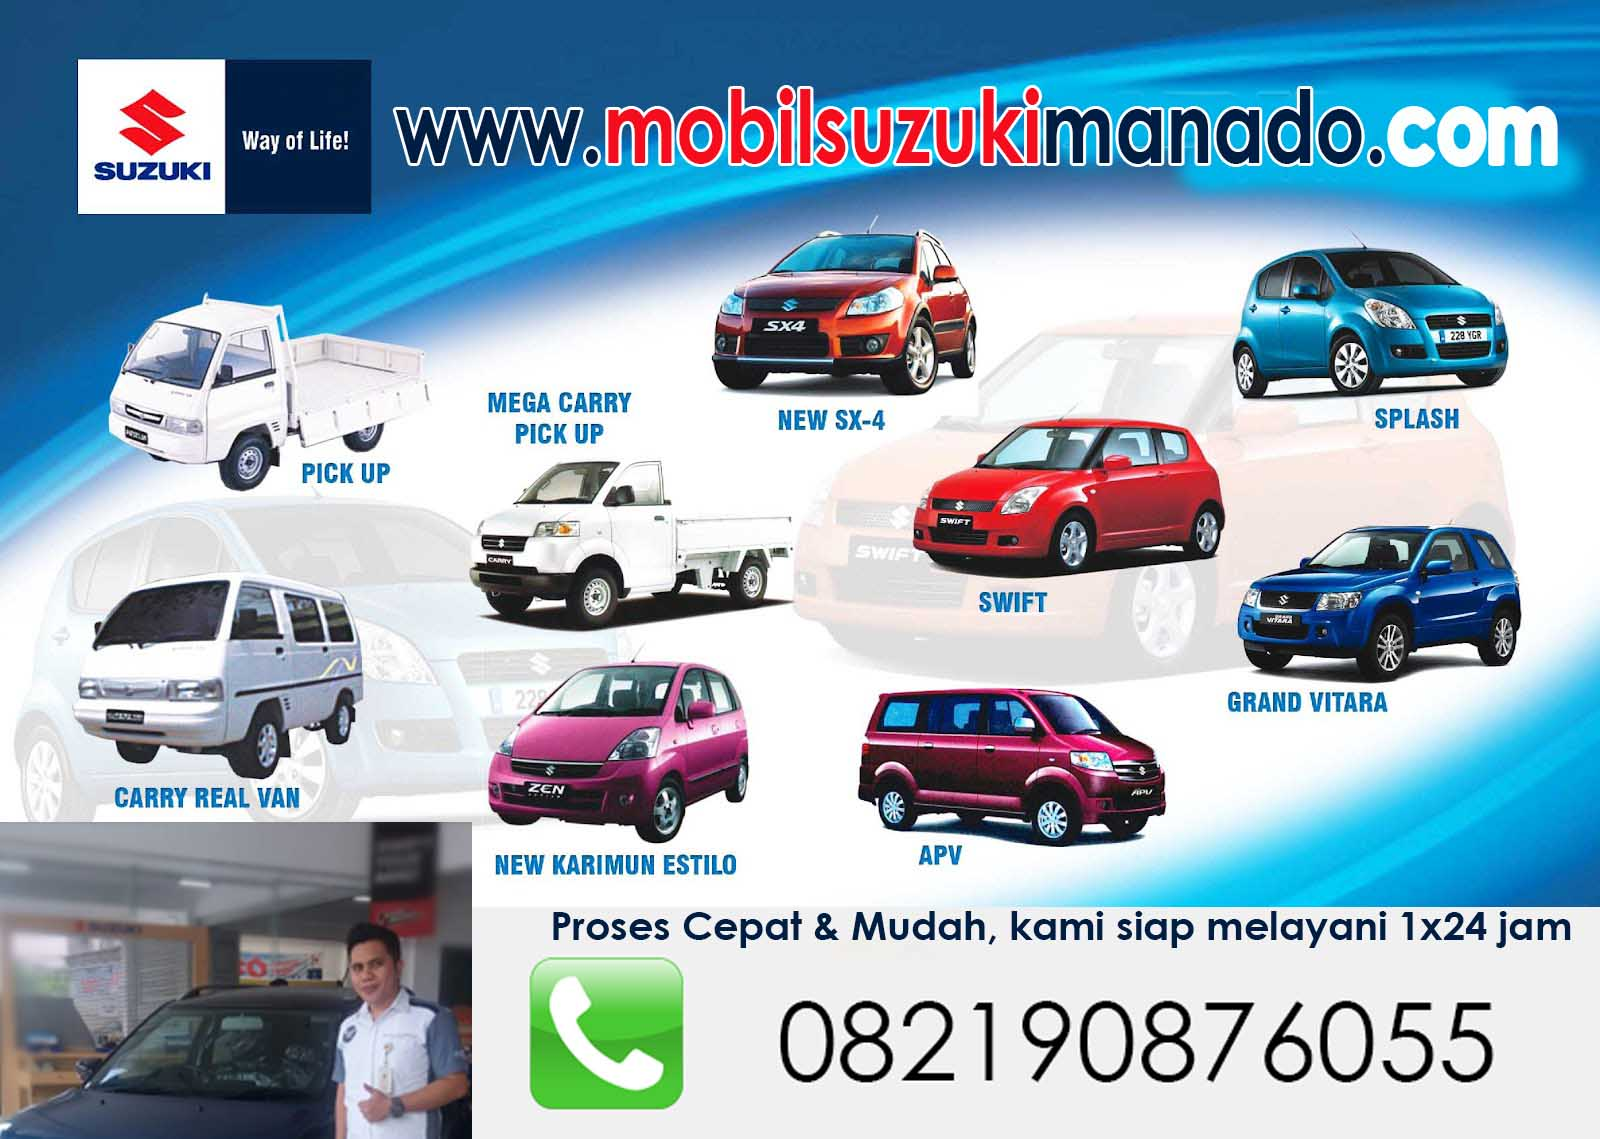 Cek Harga Mobil Suzuki Manado